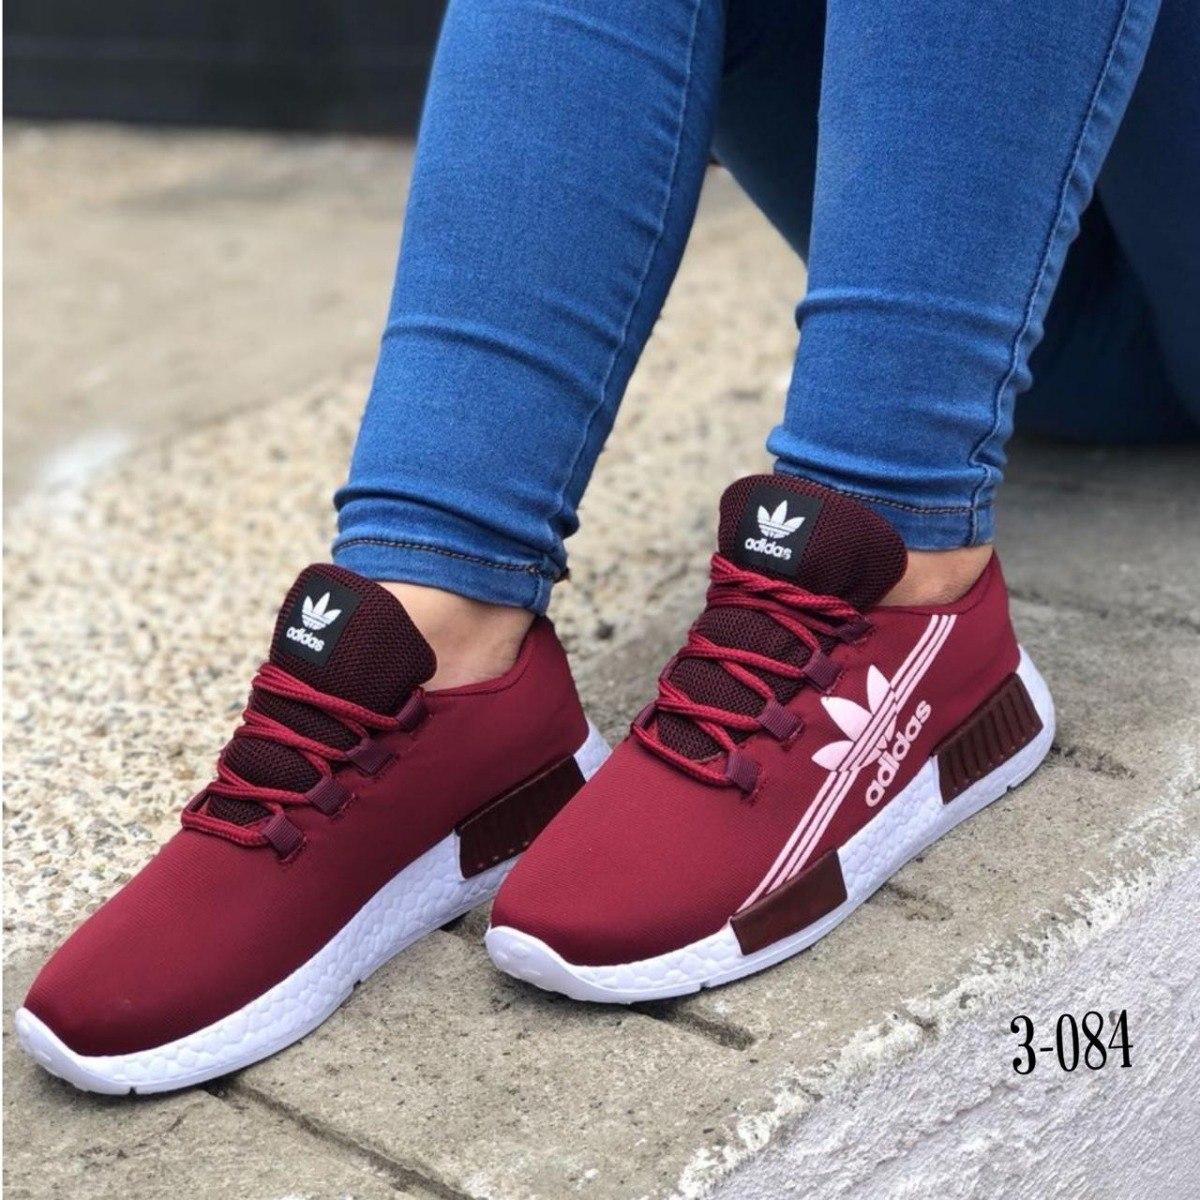 e724c6f4205 Zapatos deportivos variado para damas moda colombiana cargando zoom jpg  1200x1200 Colombiano moda zapatos deportivos